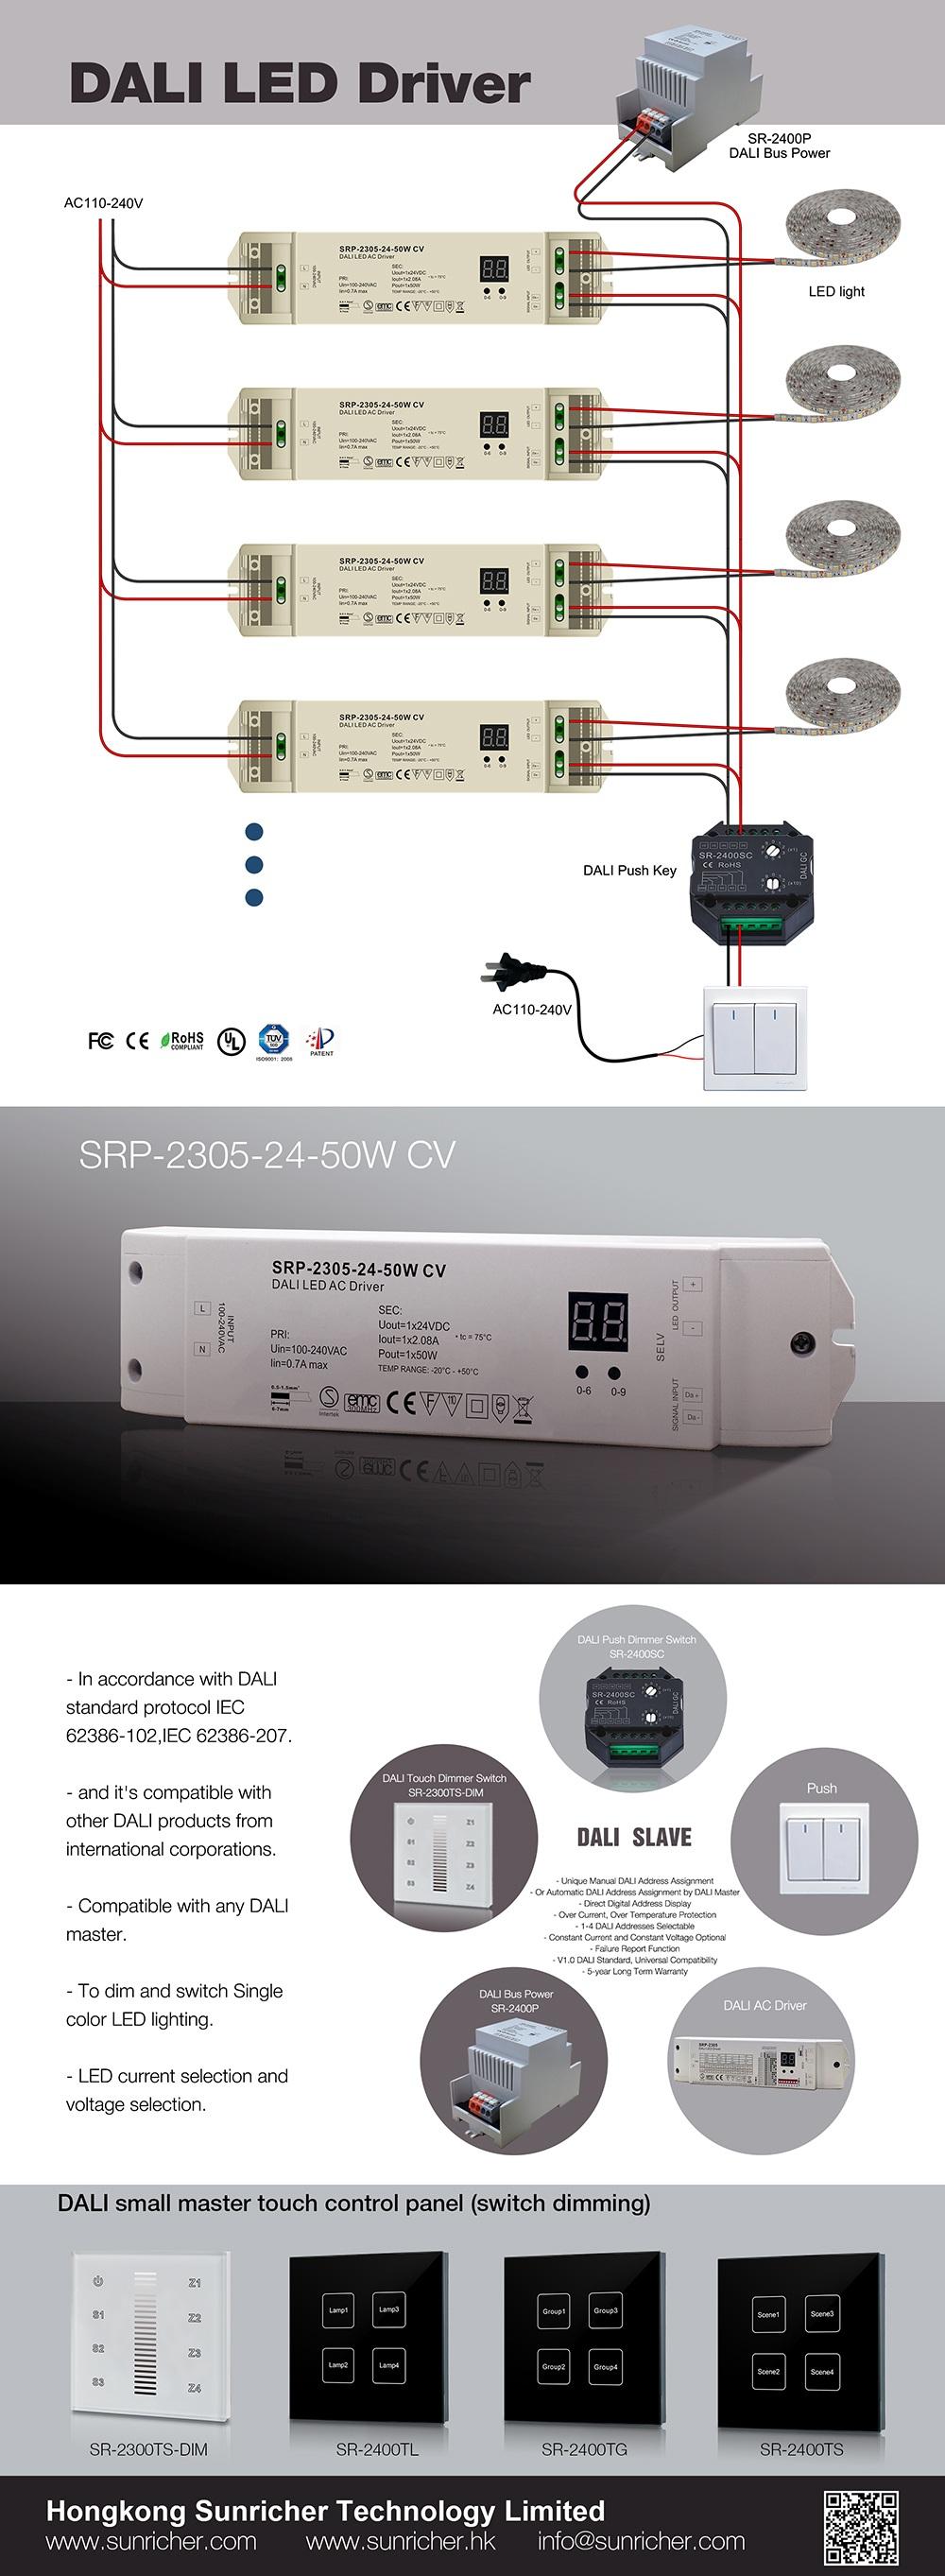 Sunricher 24v Dali Led Driver Buy Product On Drivers Wiring Diagram 240v